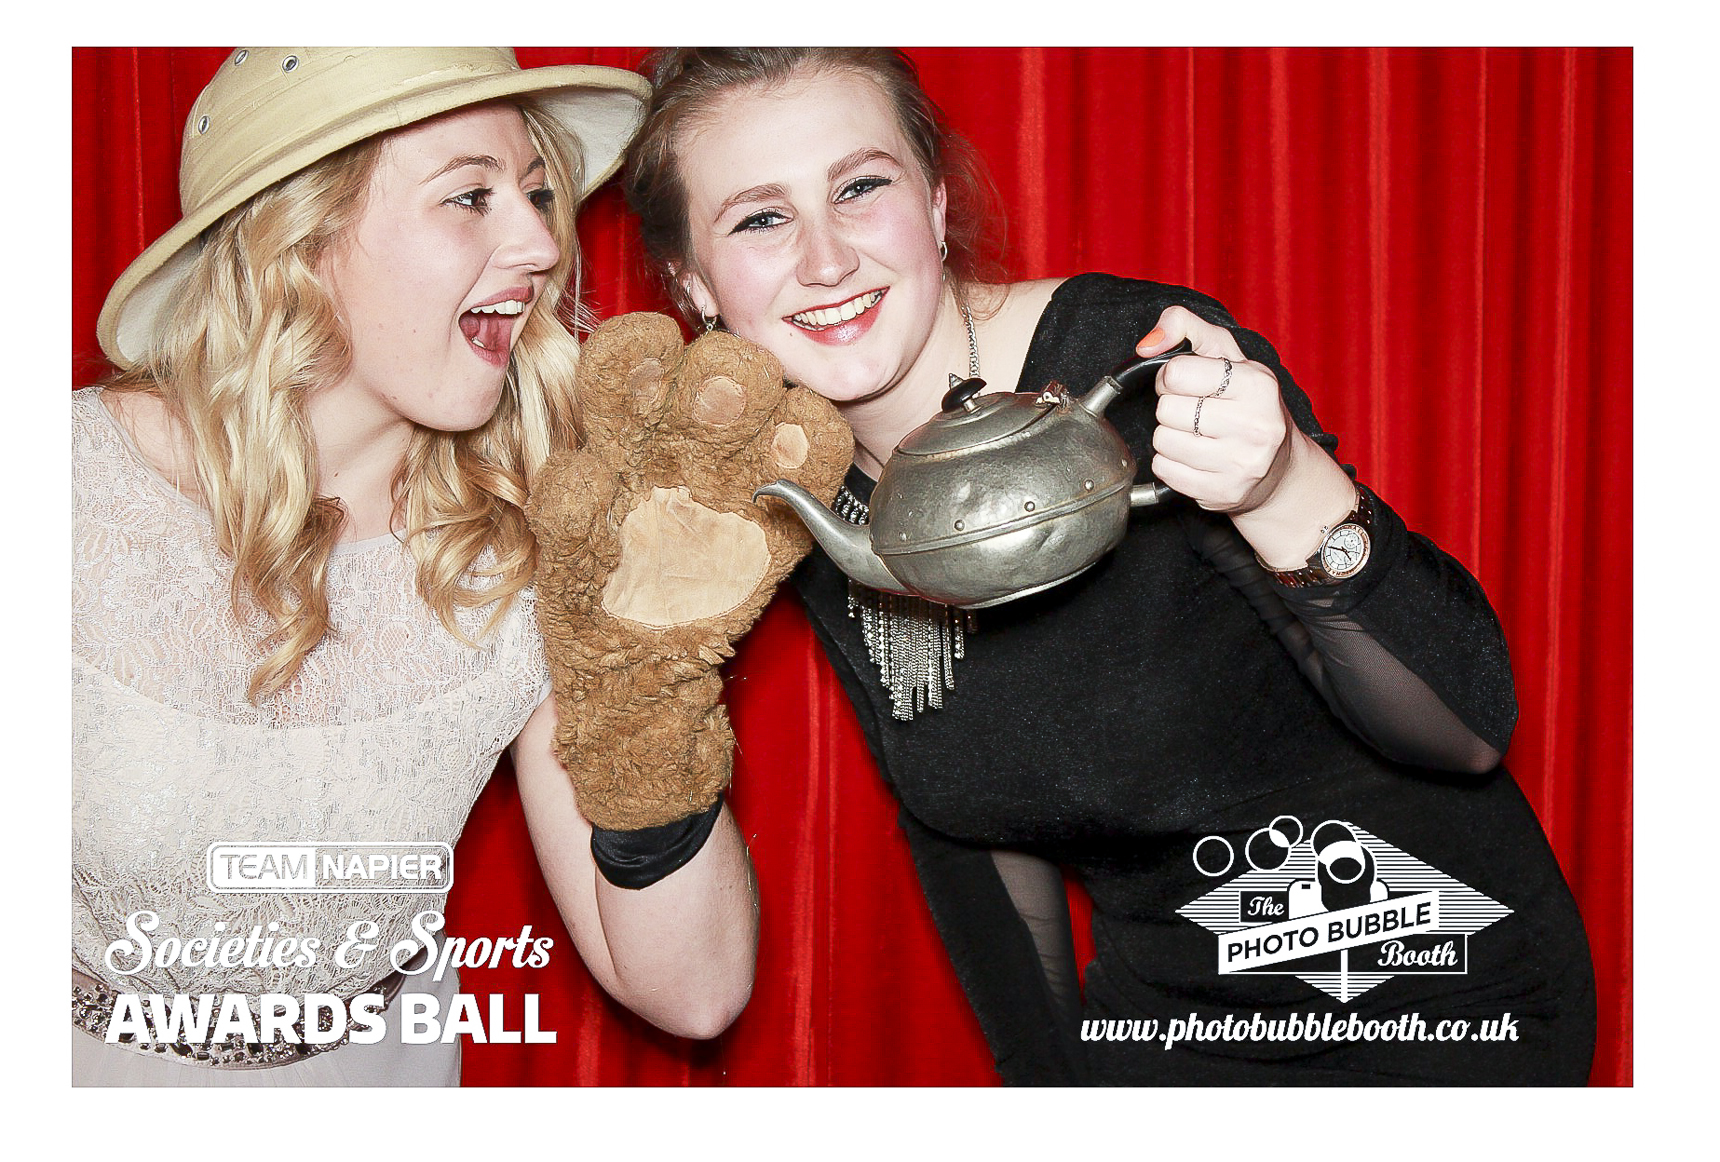 Napier Societies & Sports Awards_2.JPG